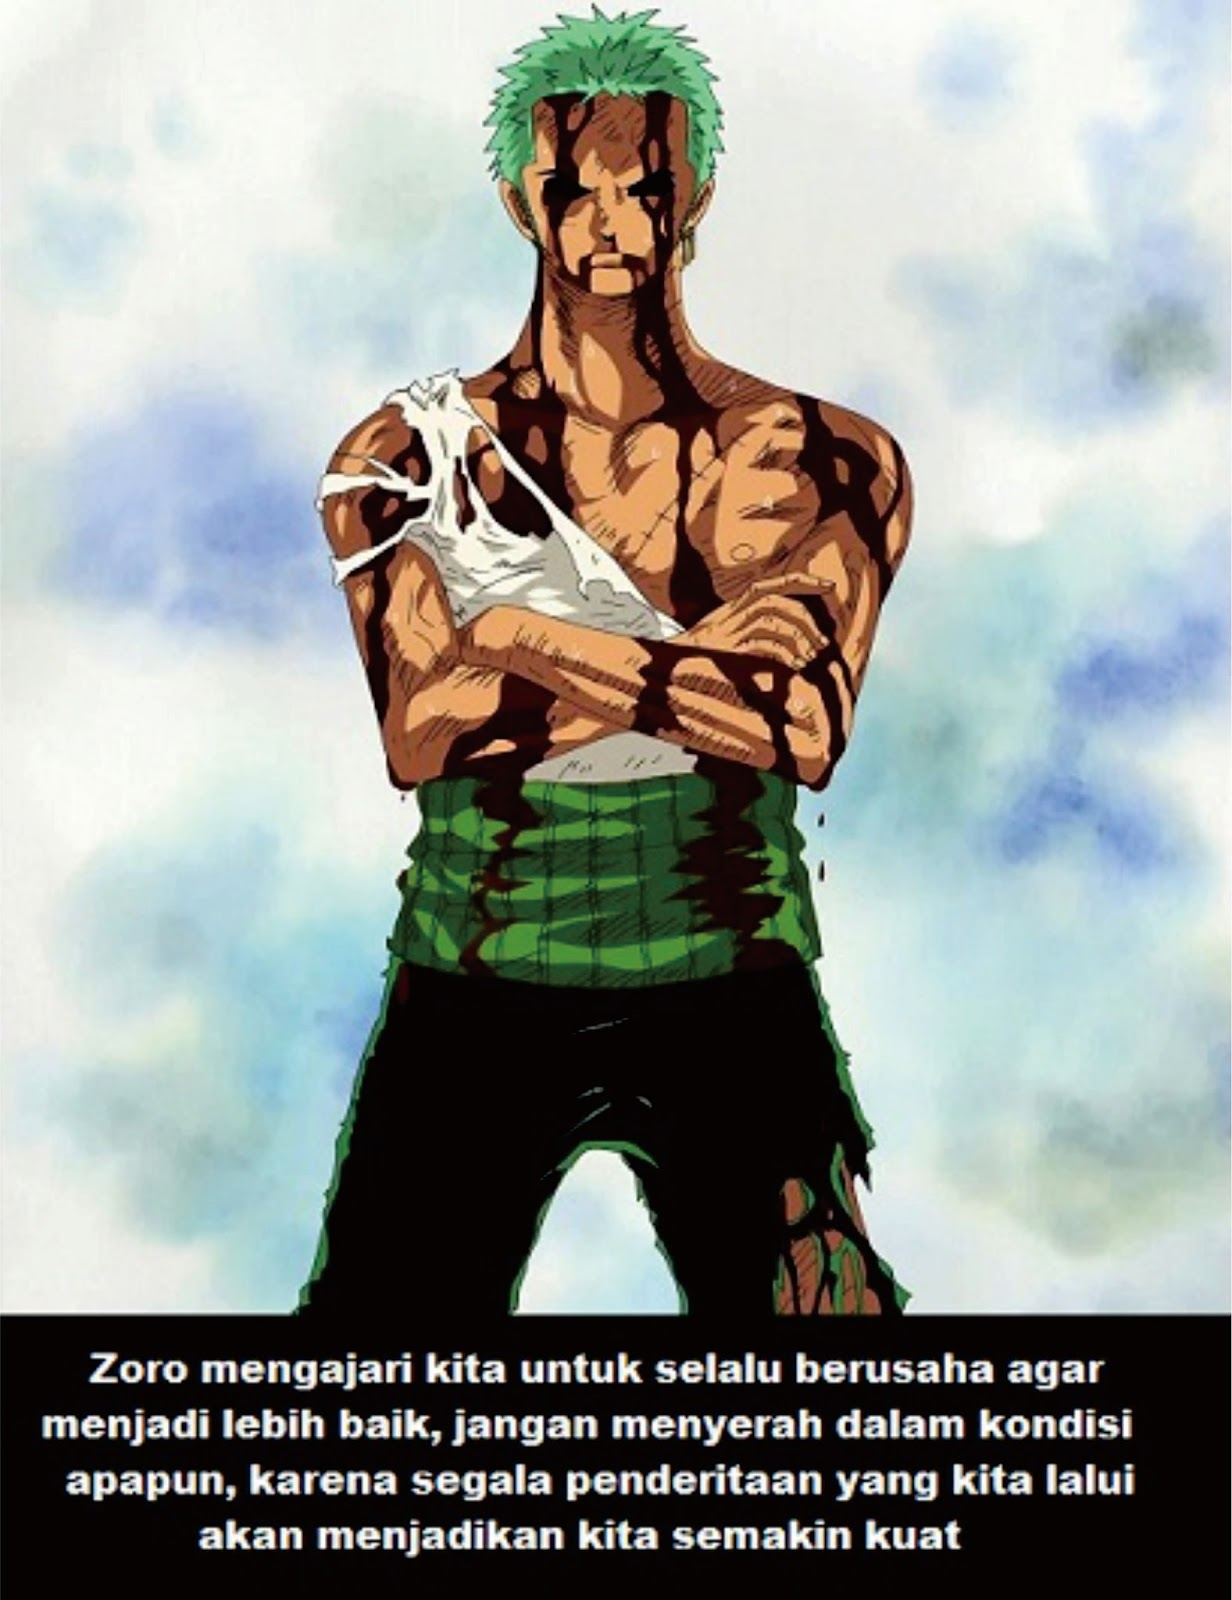 Kumpulan Kata Bijak One Piece Zoro Kumpulan Gambar Meme Lucu